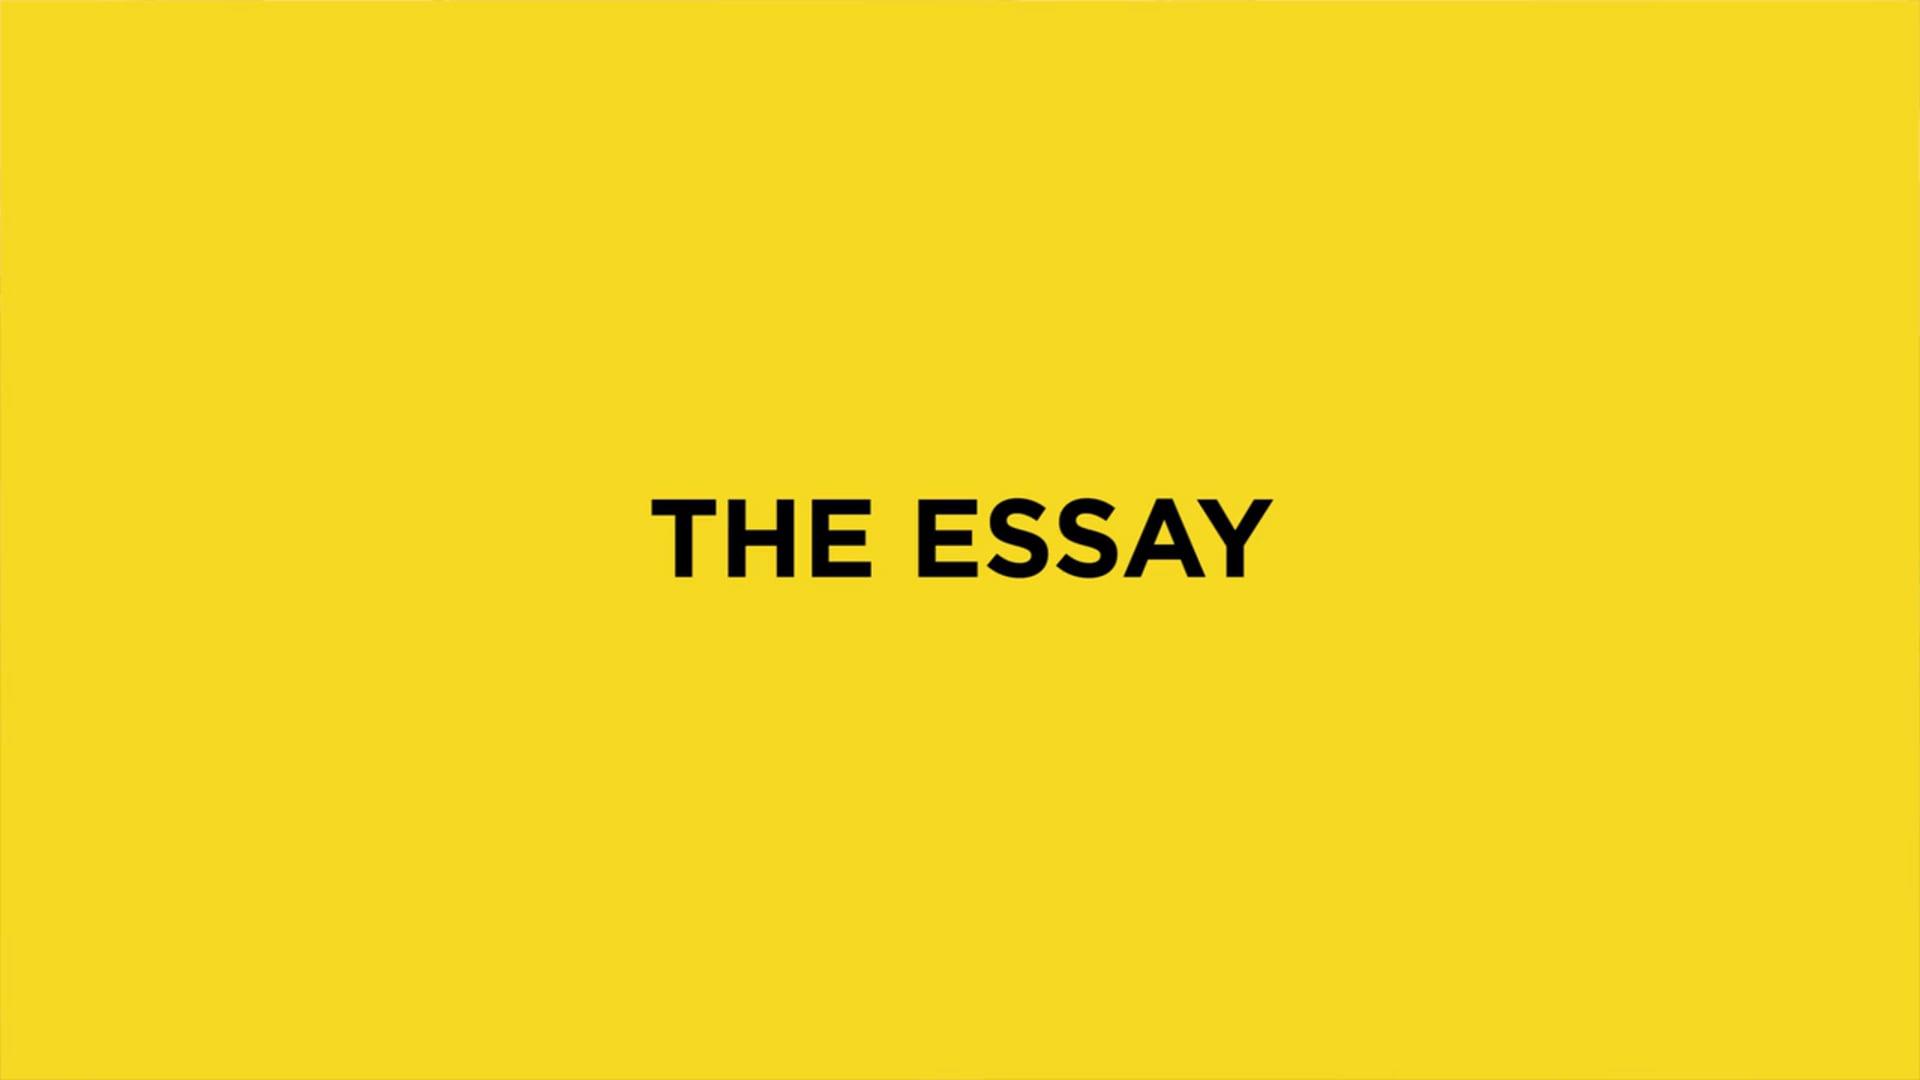 Twinston The Essay